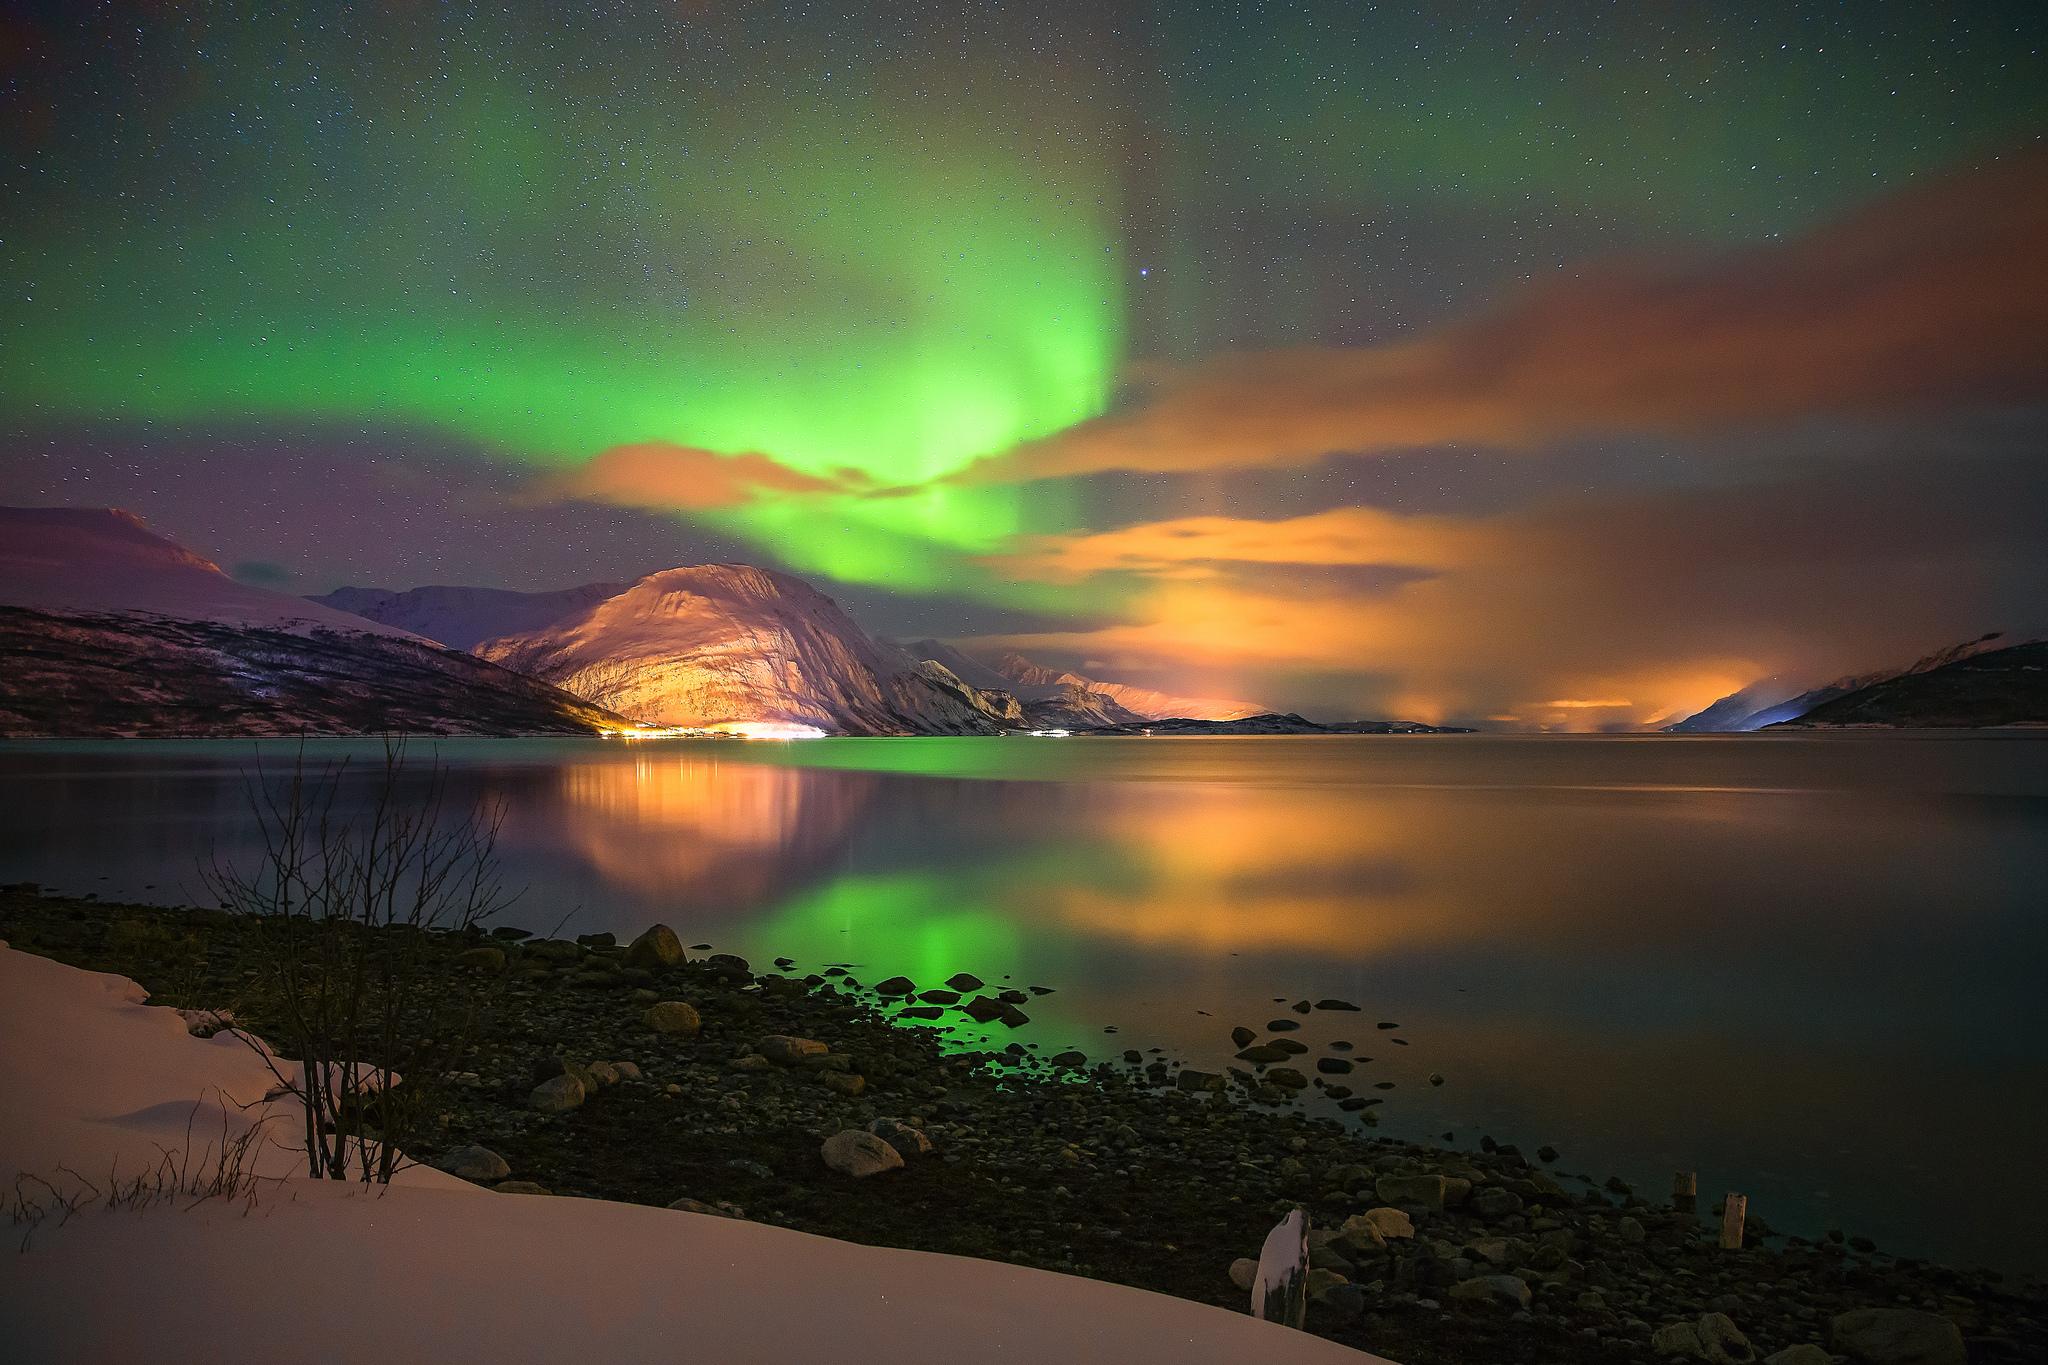 Wallpaper aurora borealis the northern lights sky stars mountains 2048x1365